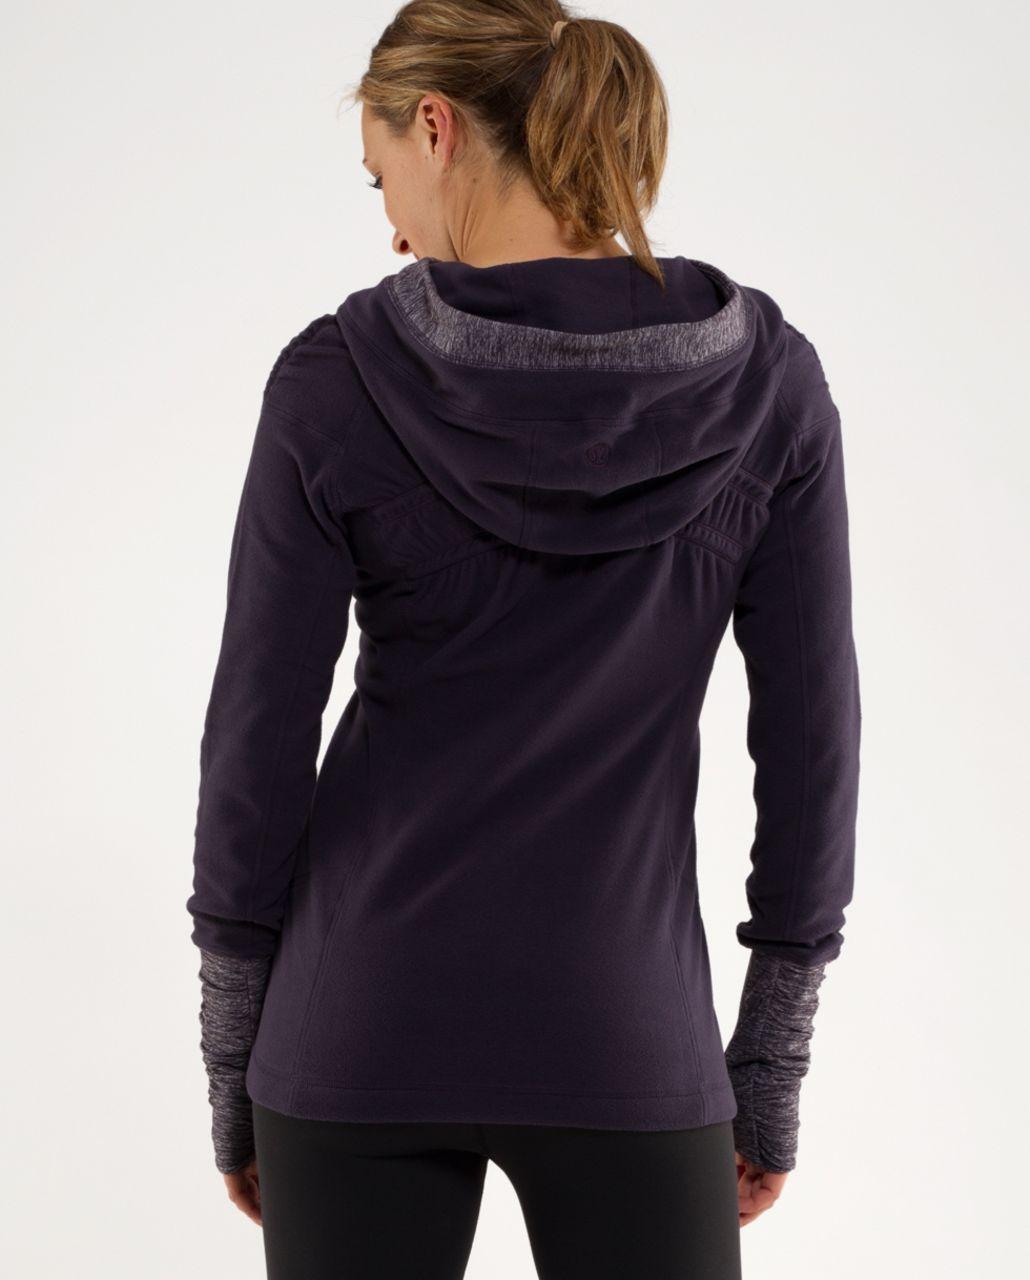 Lululemon Apres Run Pullover - Black Swan / Heathered Black Swan